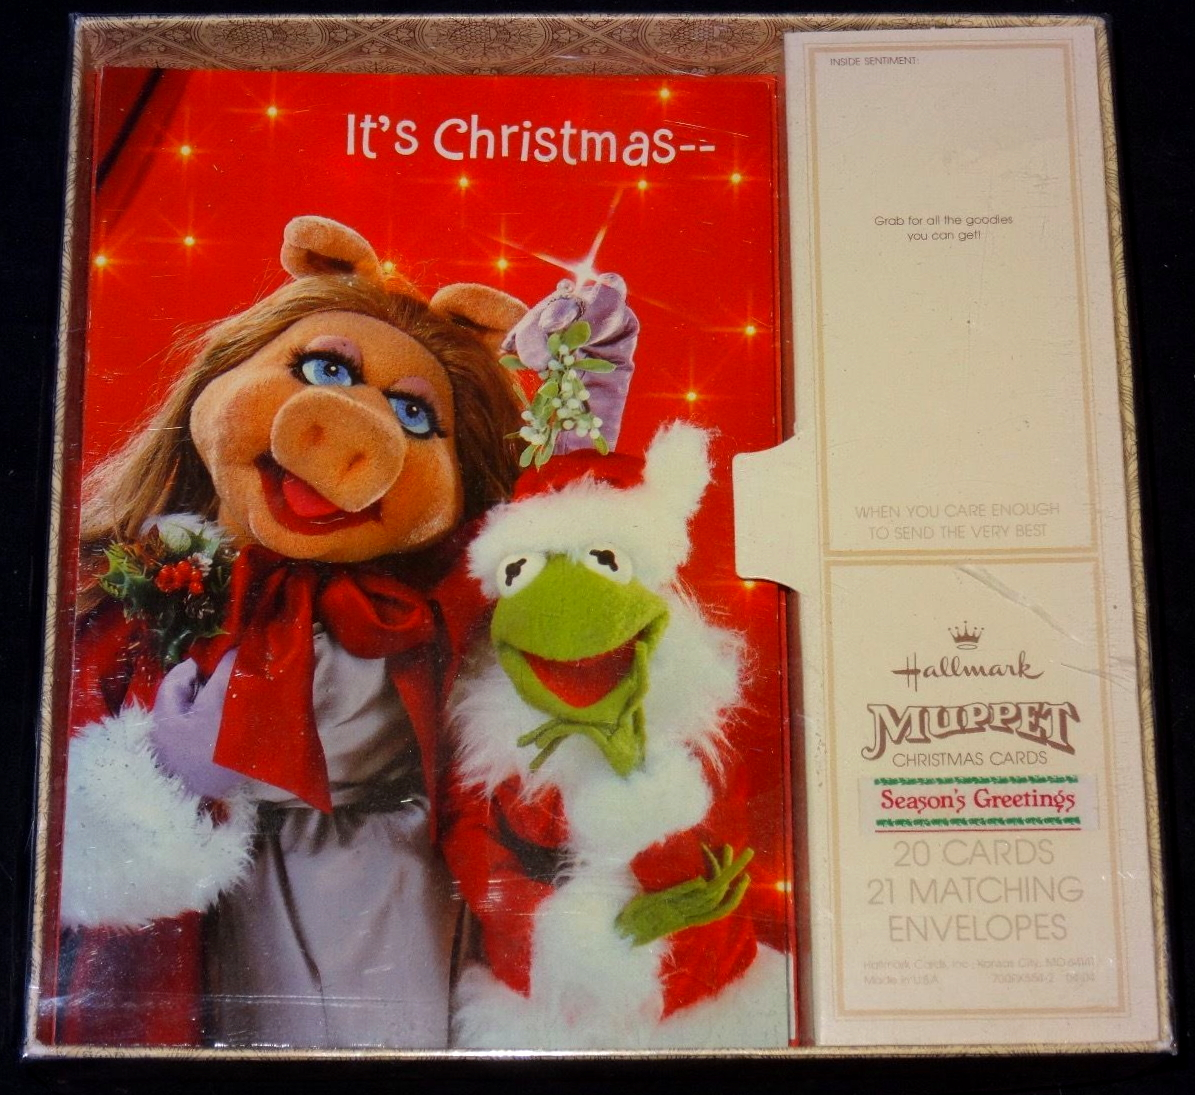 Muppet Christmas cards (Hallmark) | Muppet Wiki | FANDOM powered by ...